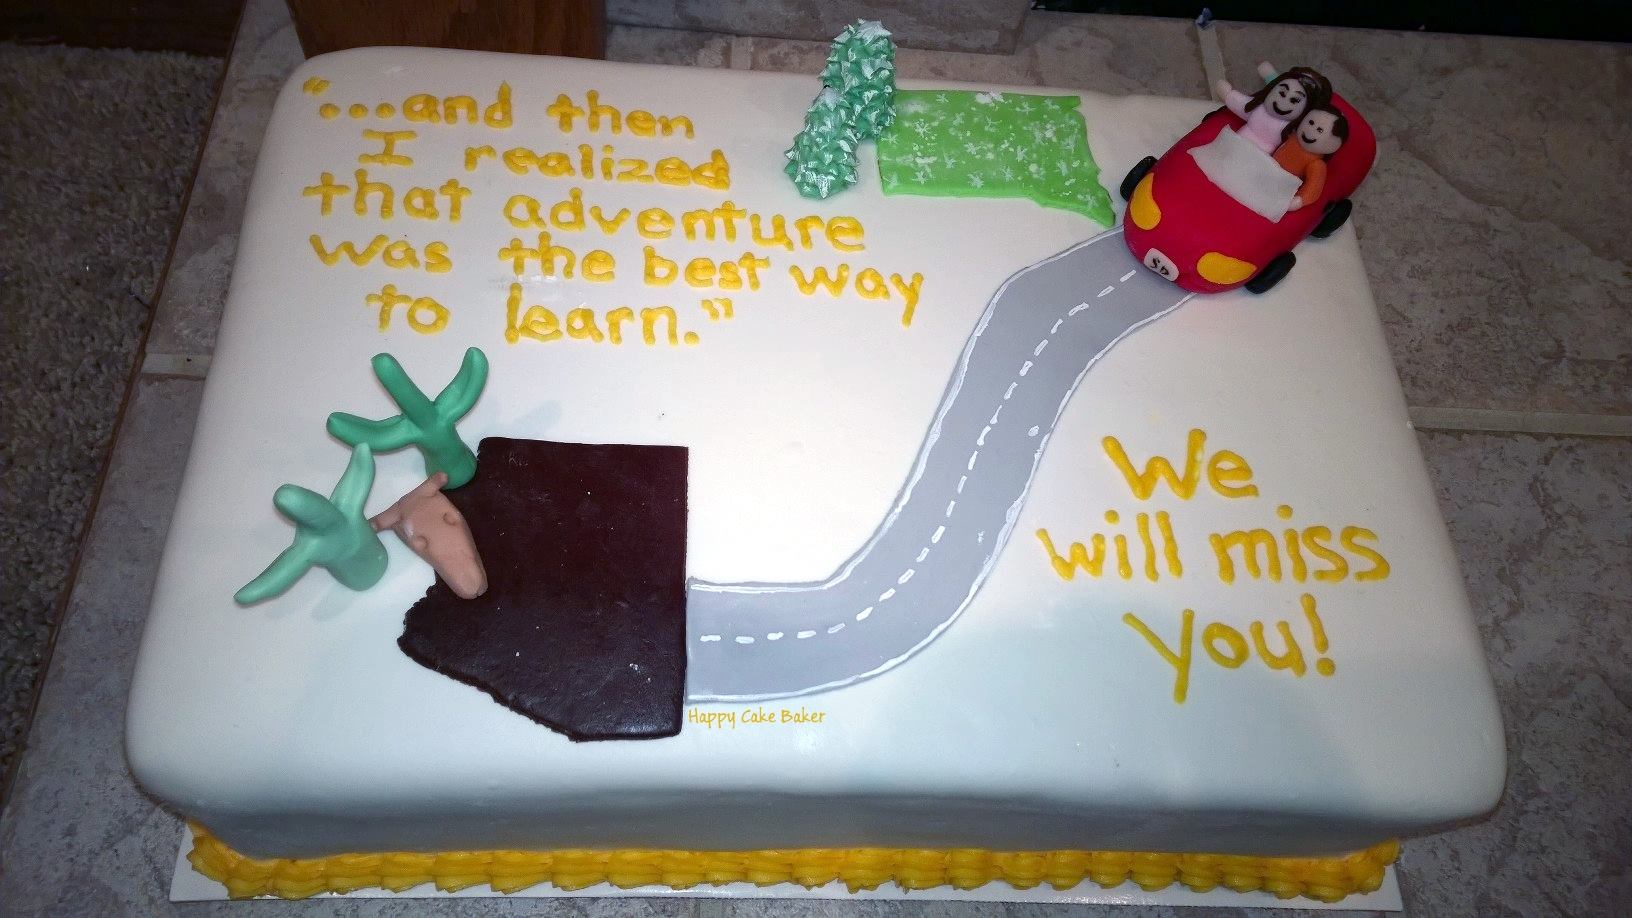 Going Away Happy Cake Baker